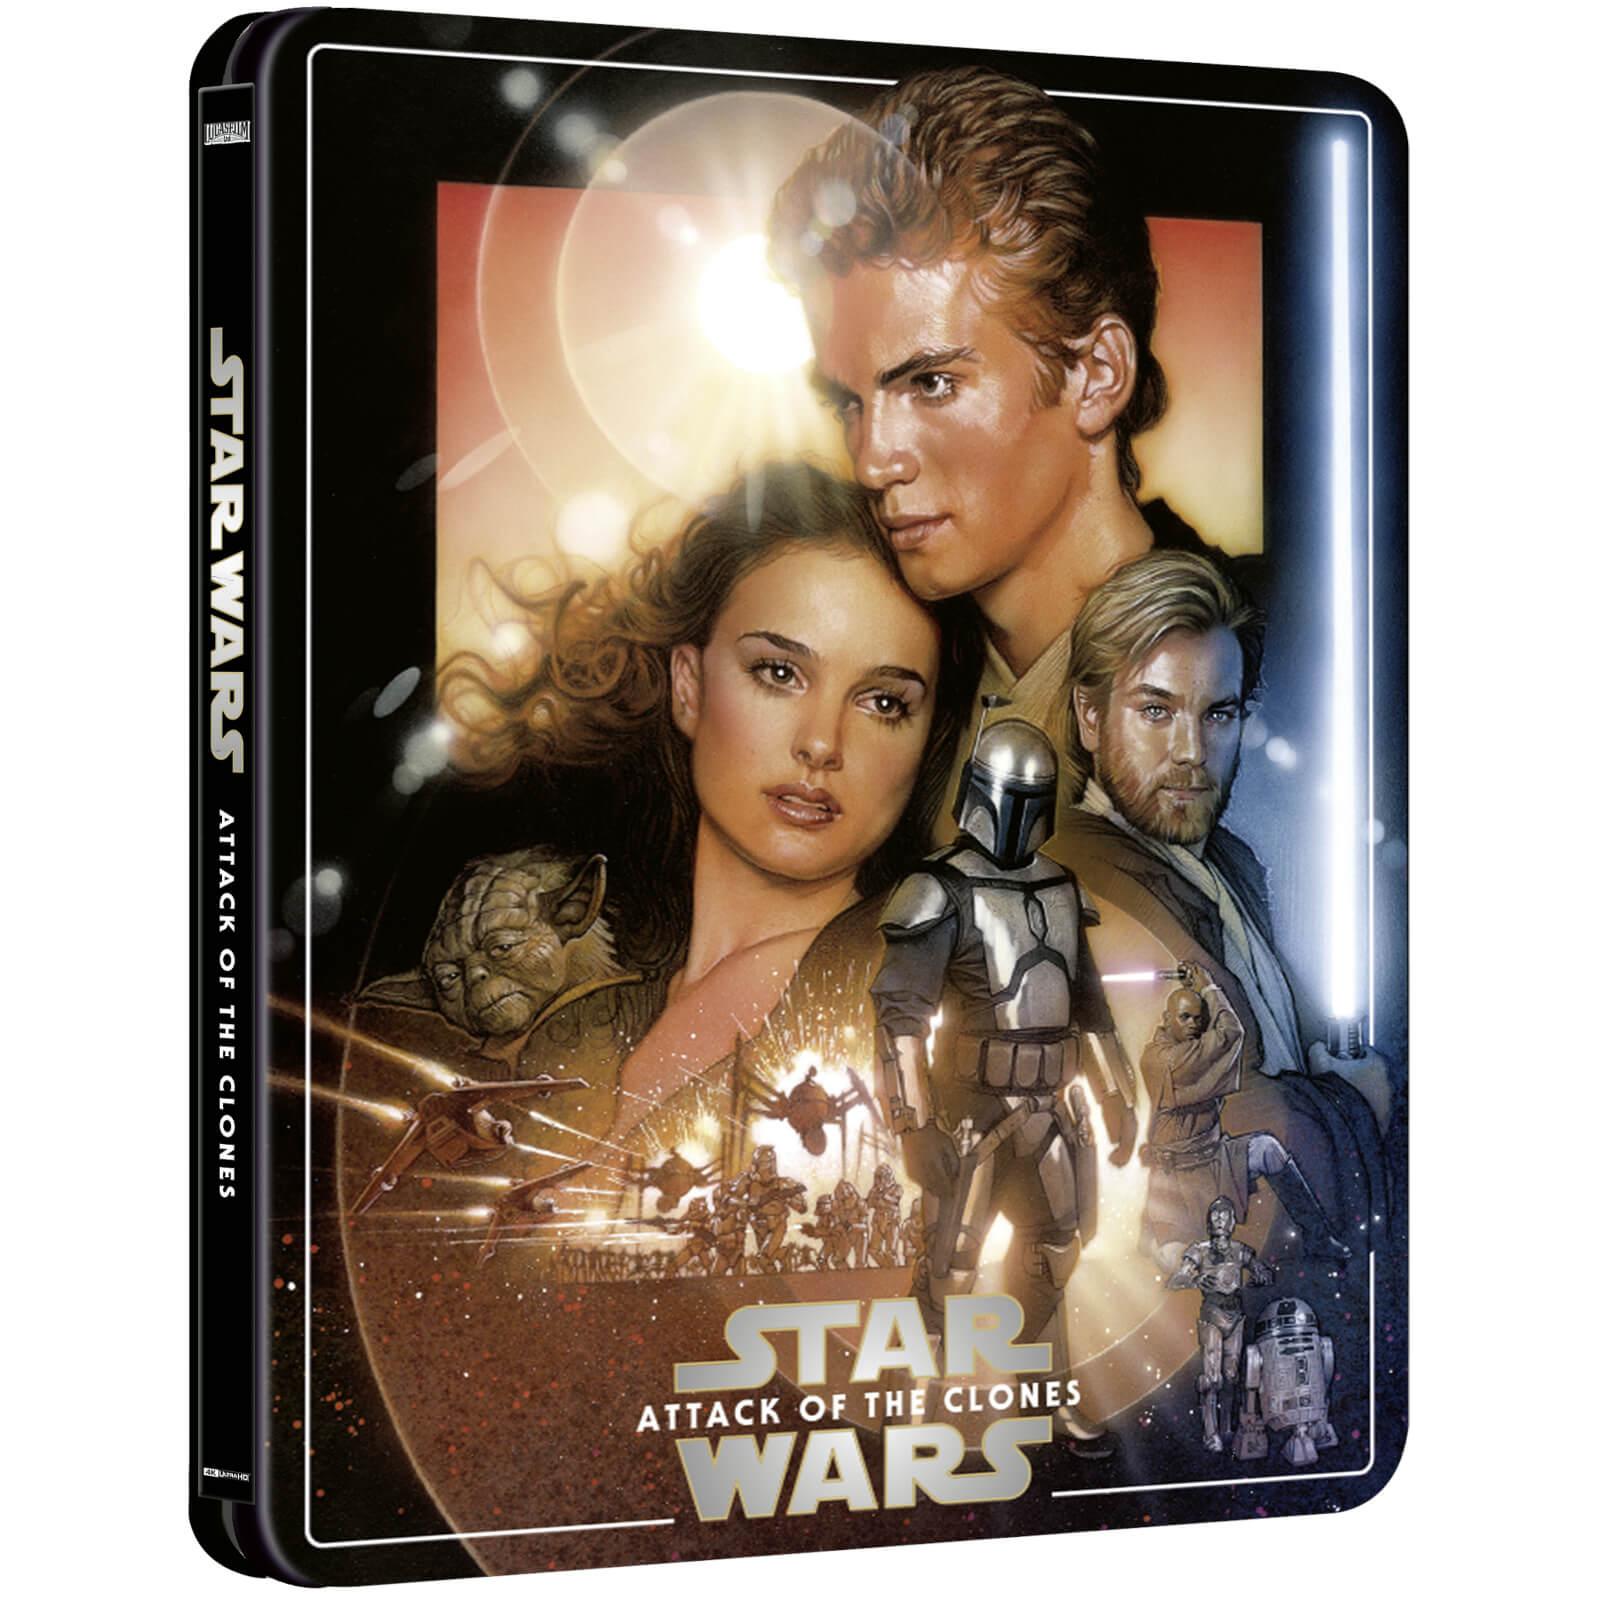 Star Wars: Attack of the Clones (Zavvi Steelbook)